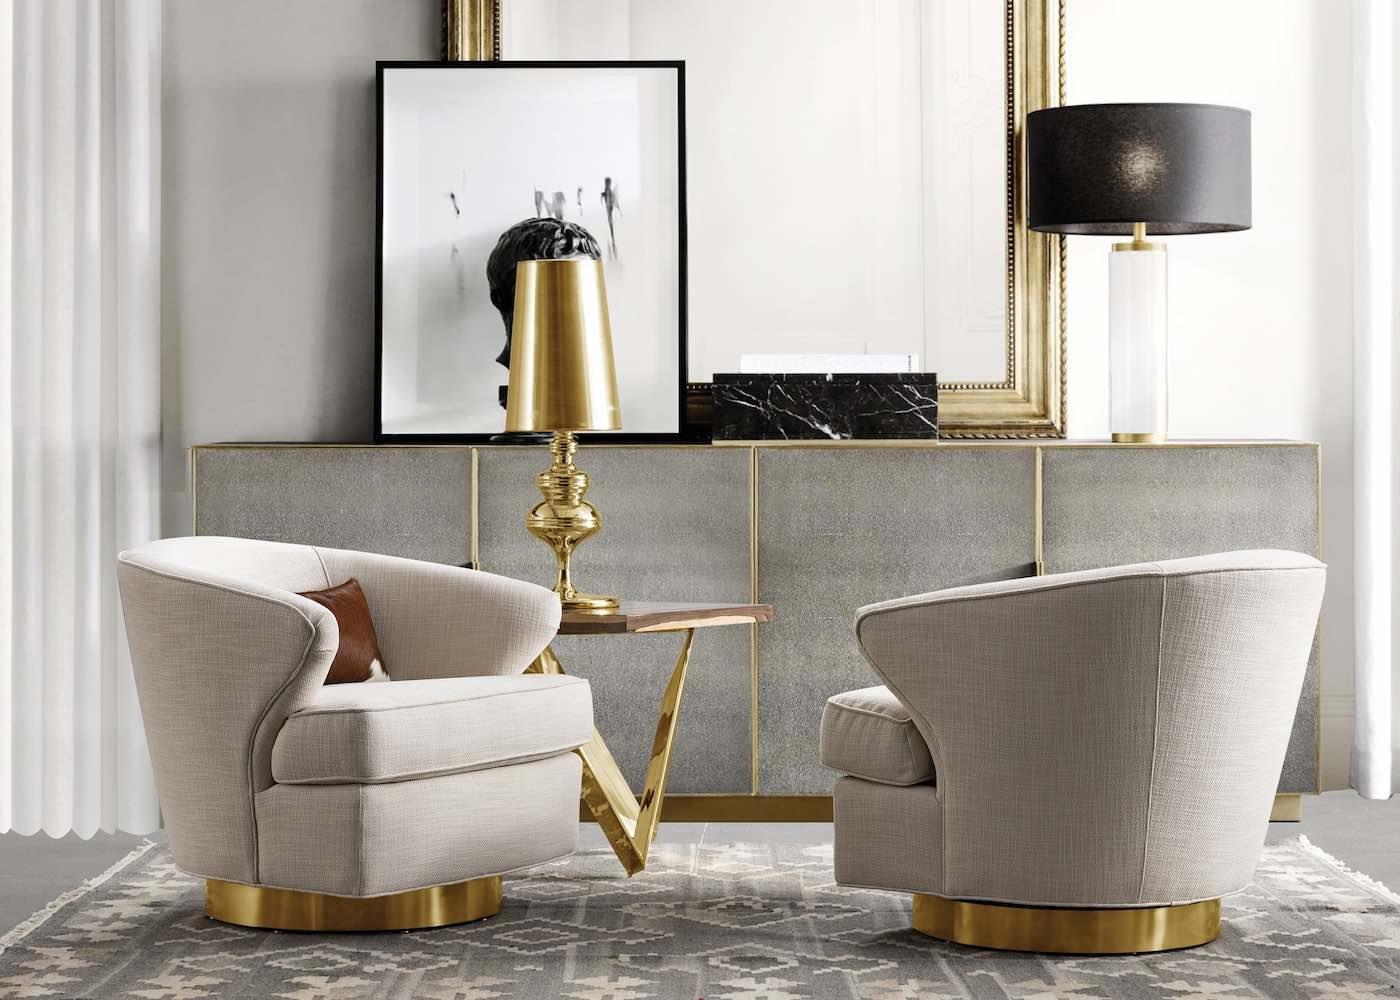 mazarin-ameublement-catalogue-produits-chaise-fauteuil-5